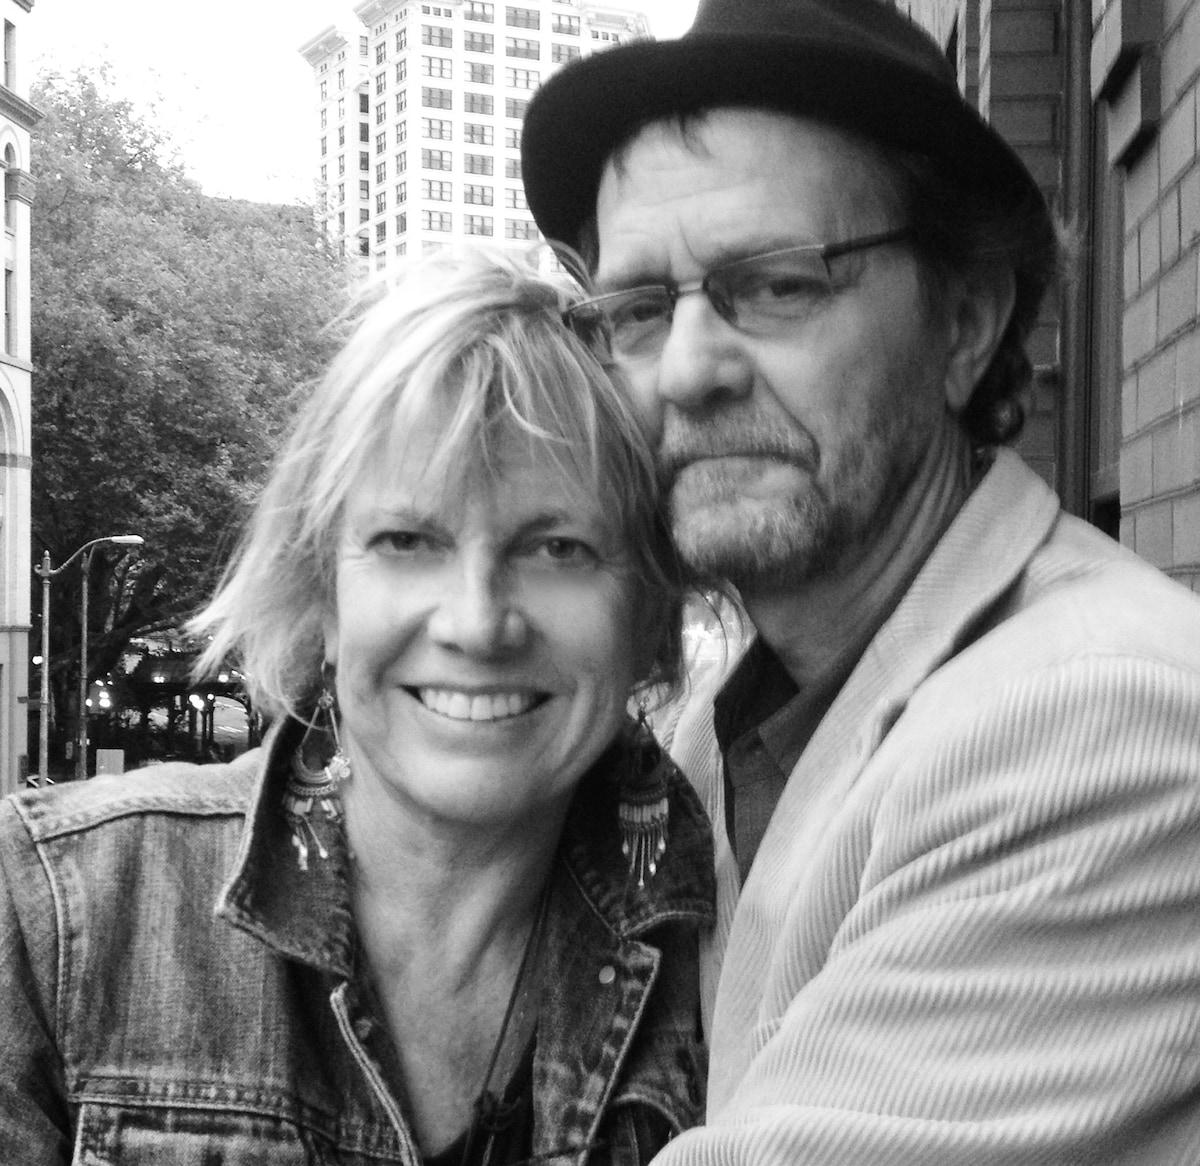 Doug & Linda From Millbrae, CA